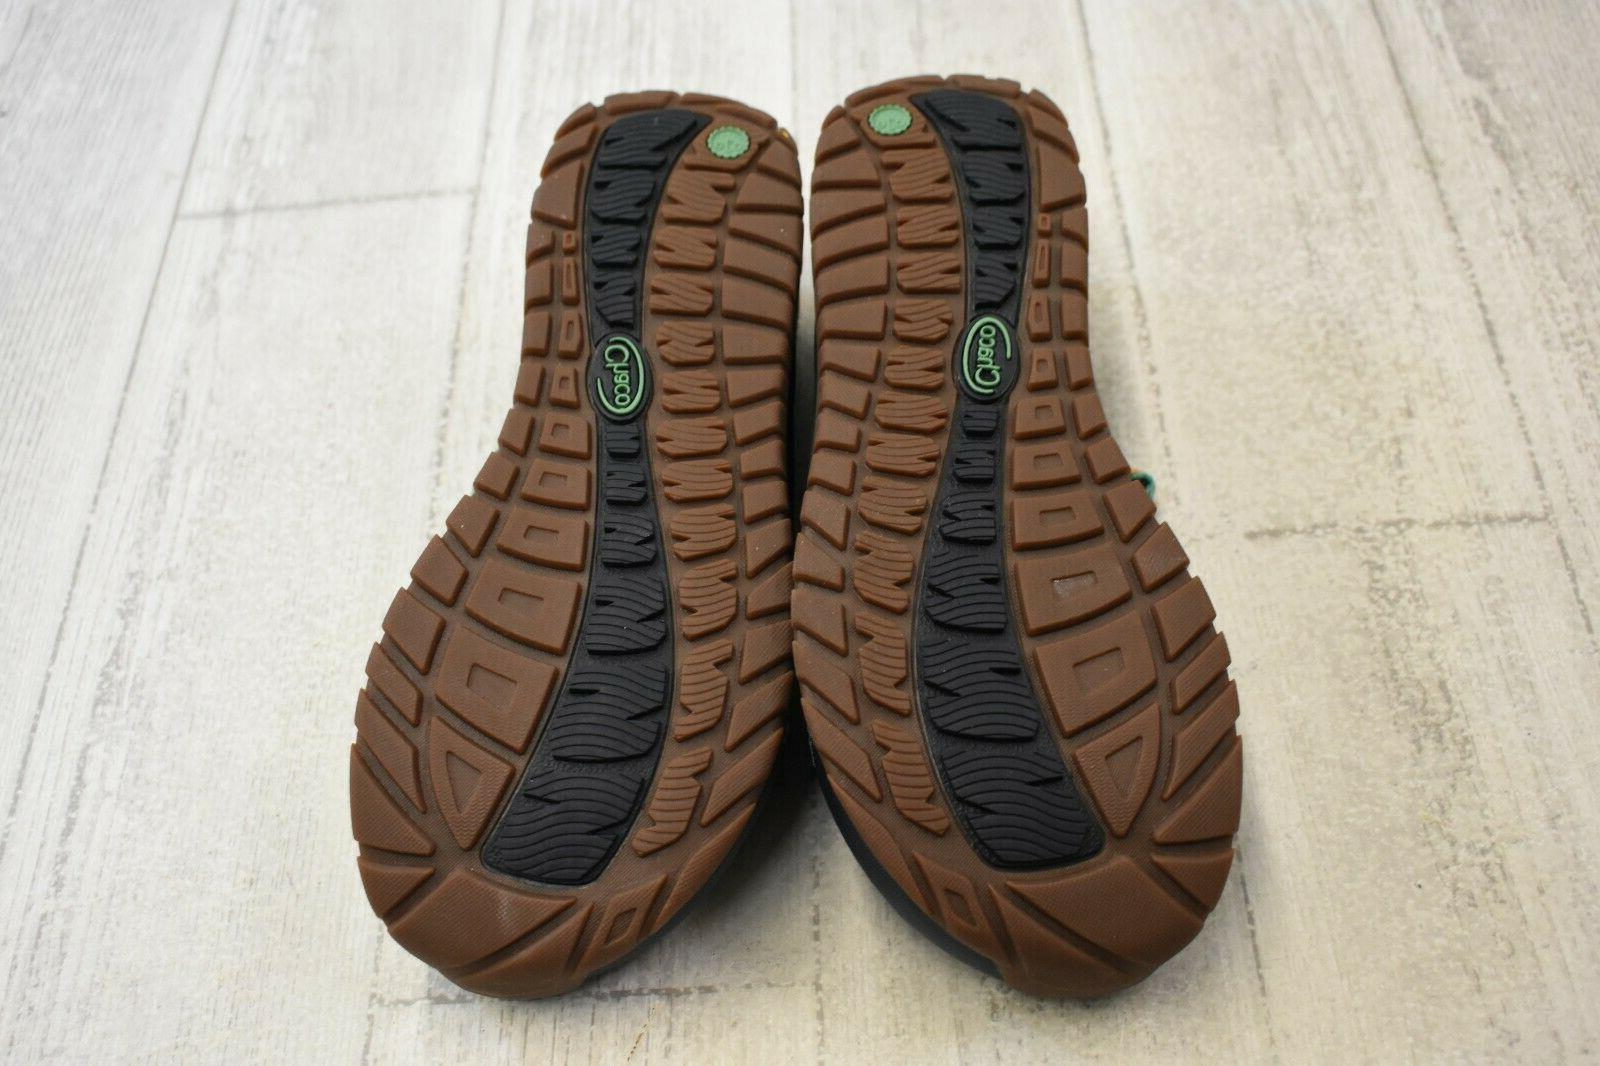 Chaco Kids Shoes Big Kid's Shoe Eclipse